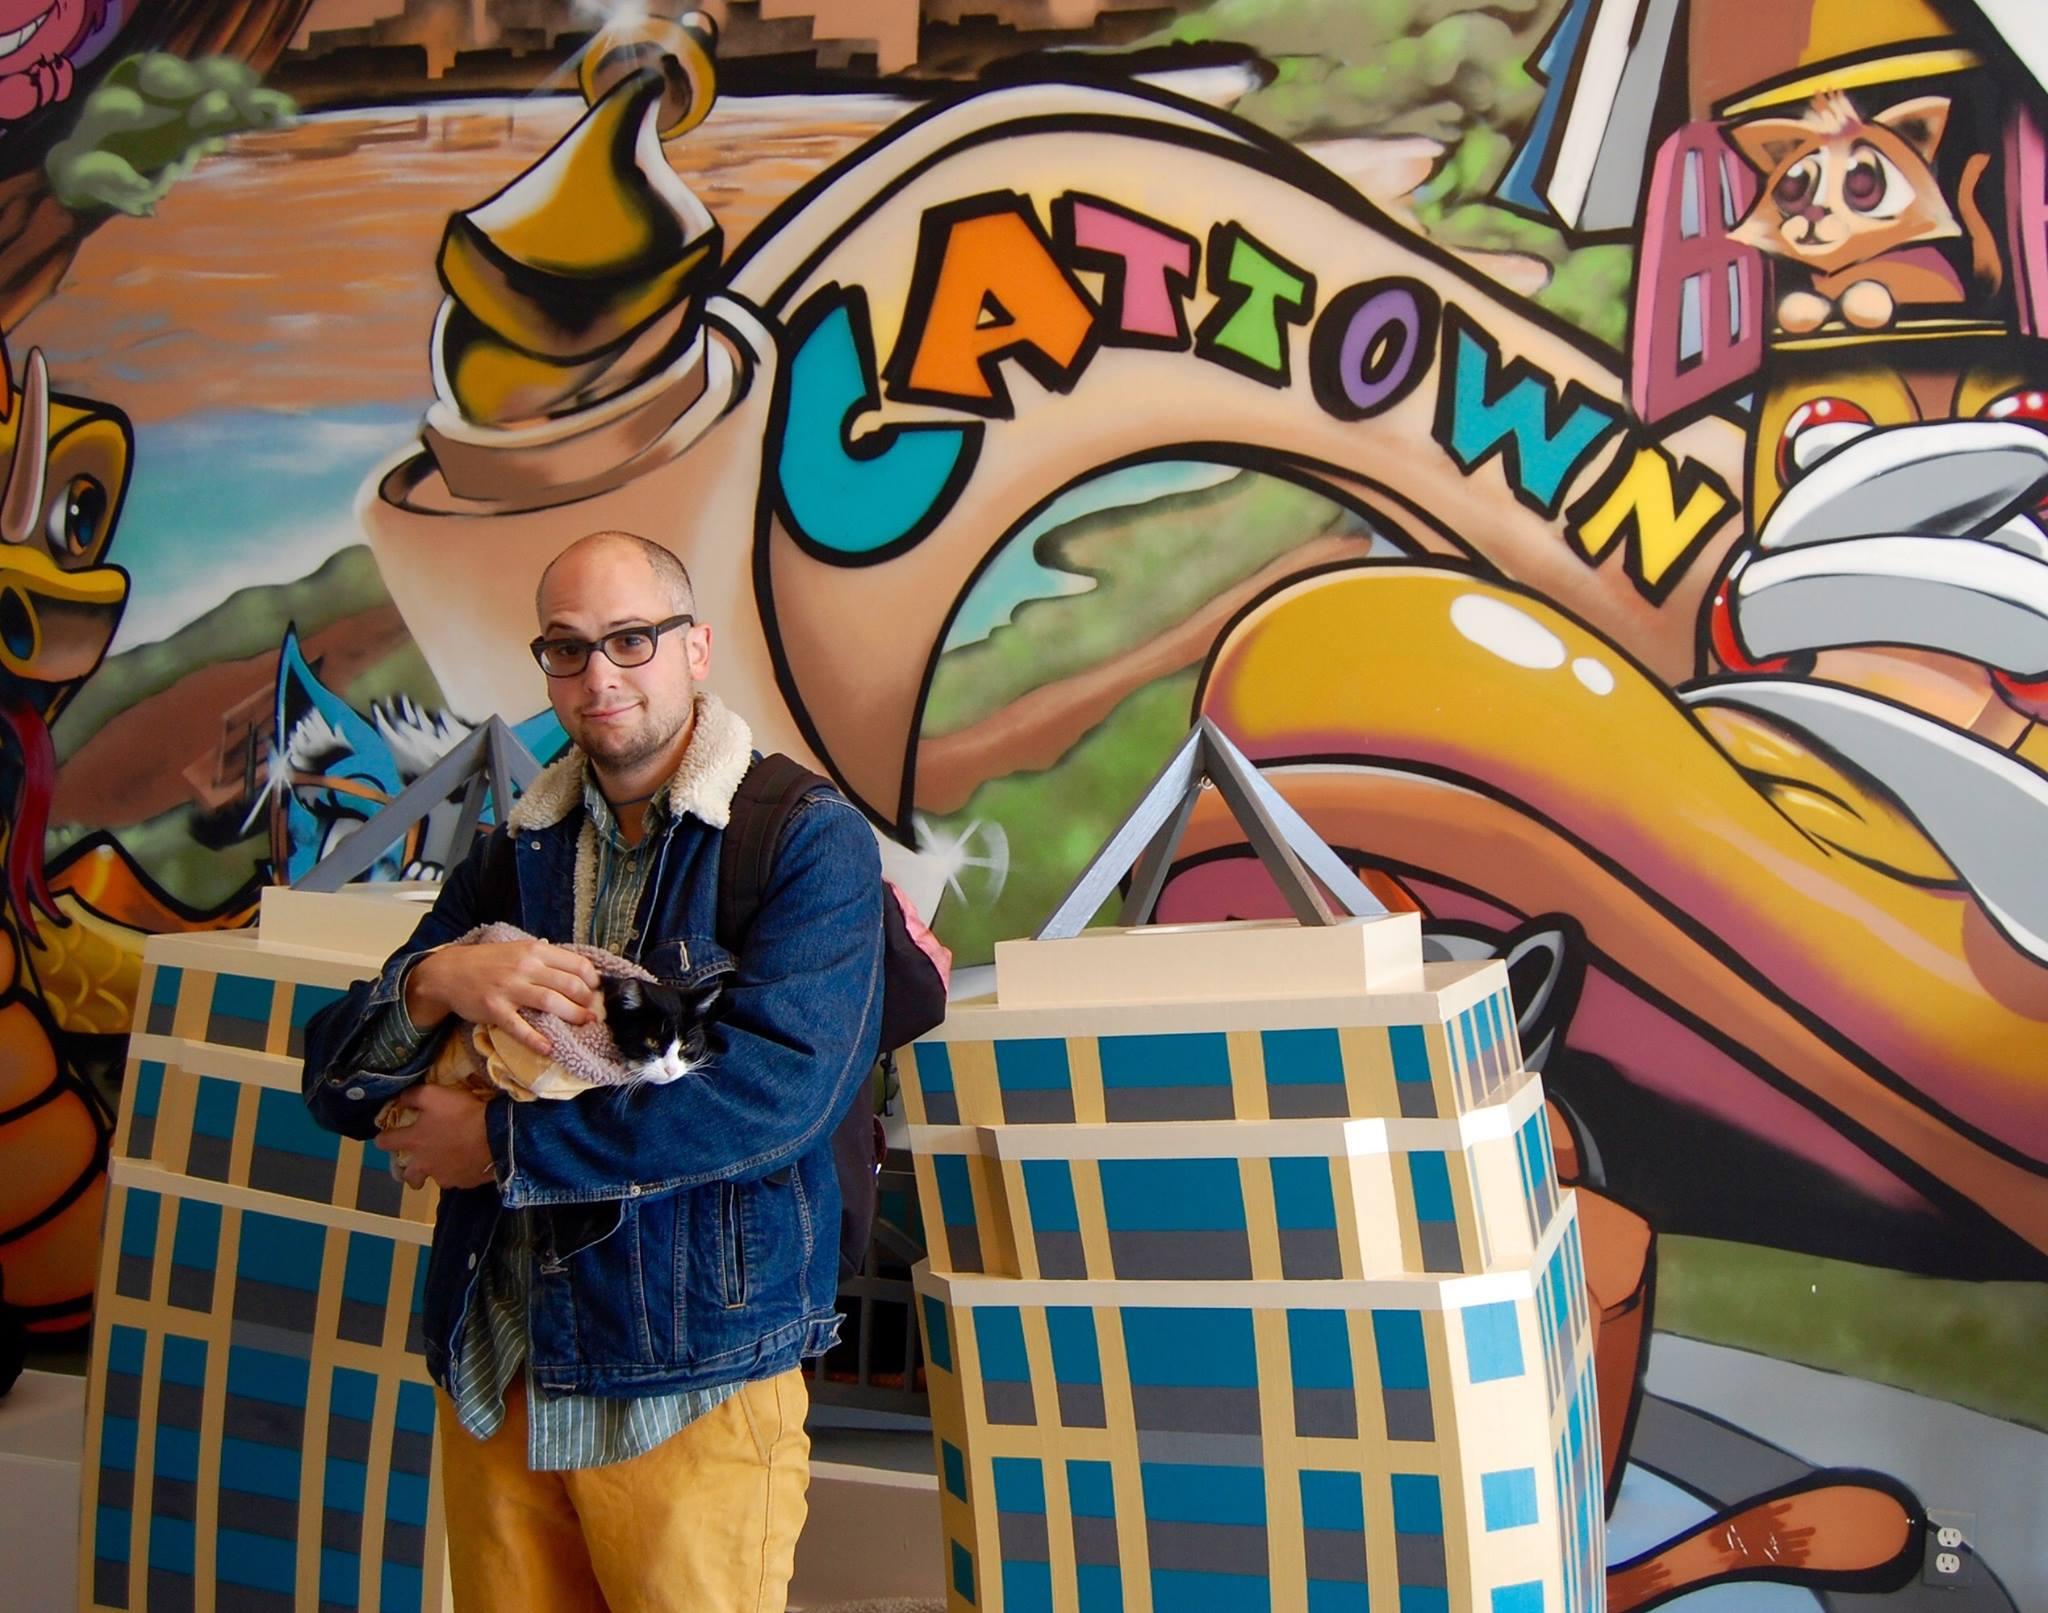 Orbitz-7-Purrfect-cat-cafes-around-the-world-Cat-Town-Cafe-.jpg